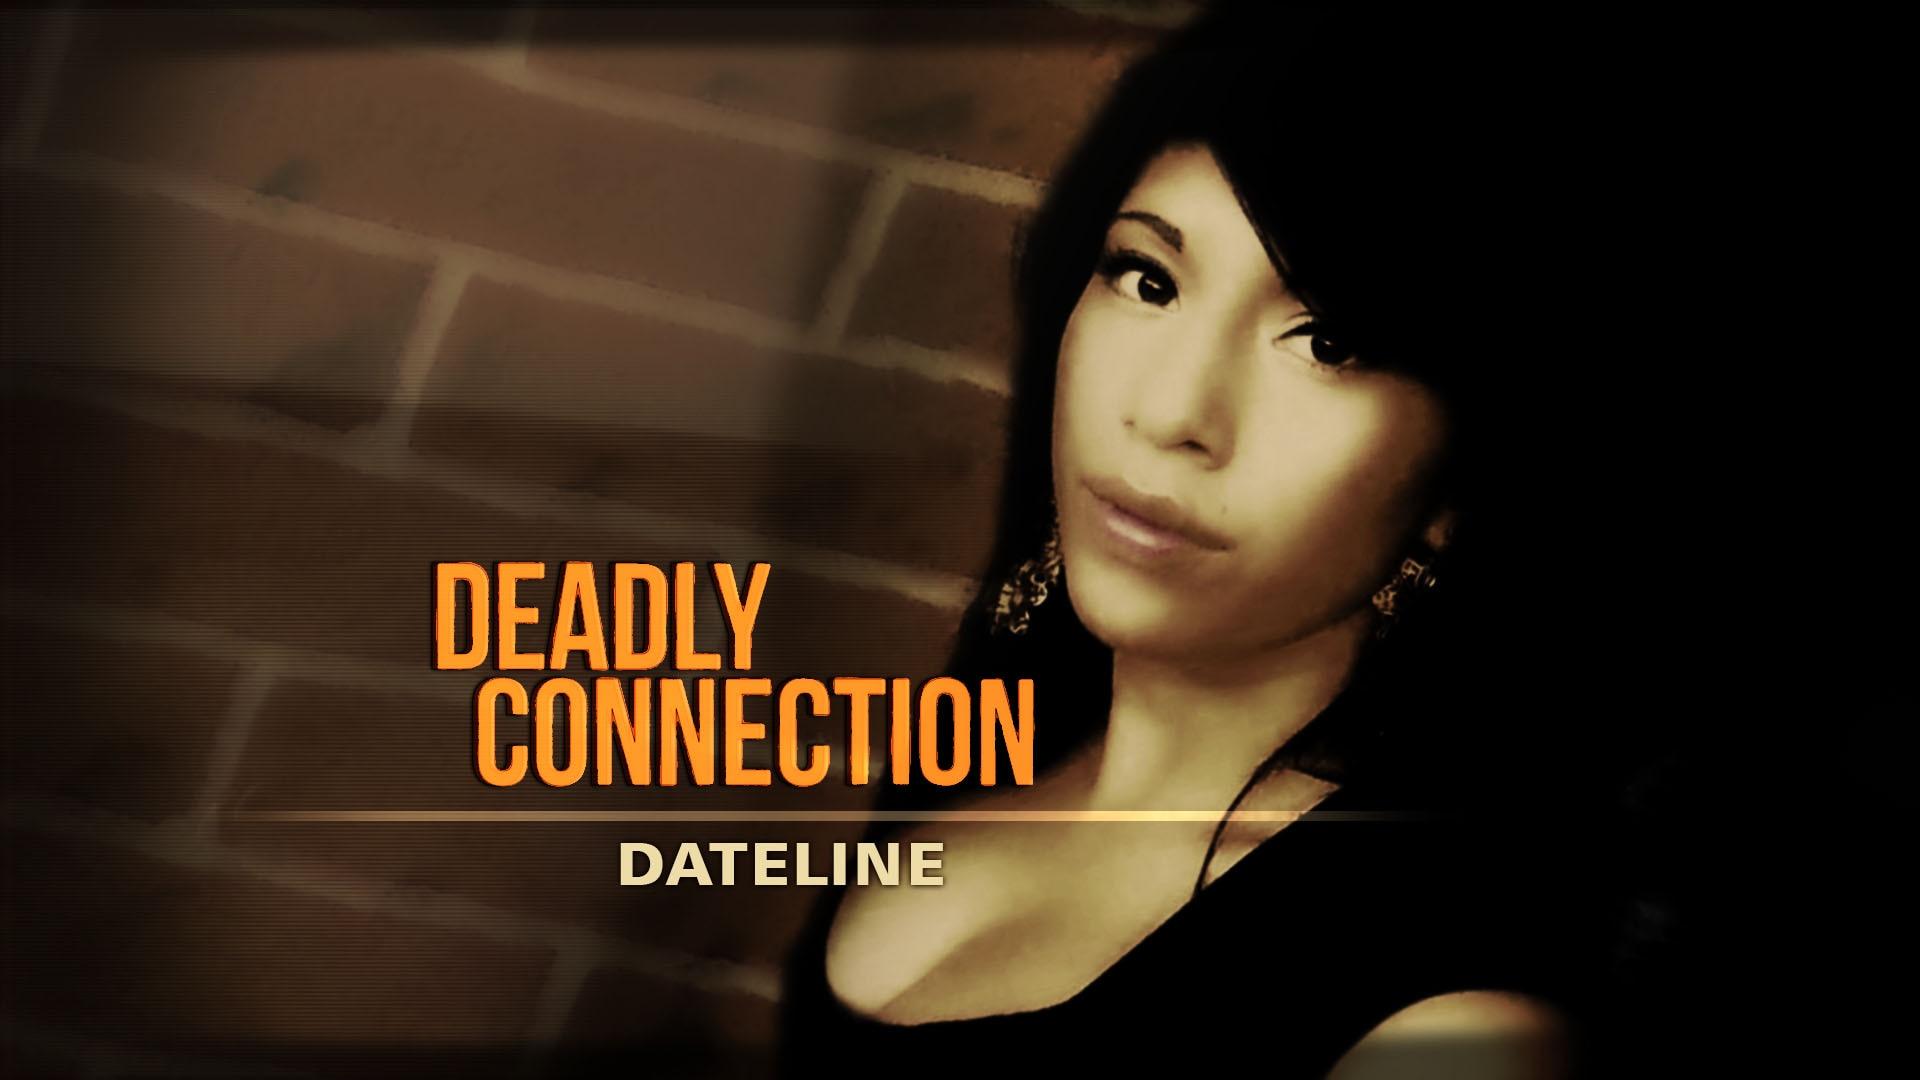 Watch Dateline Episode: Dateline 01-01 - NBC.com